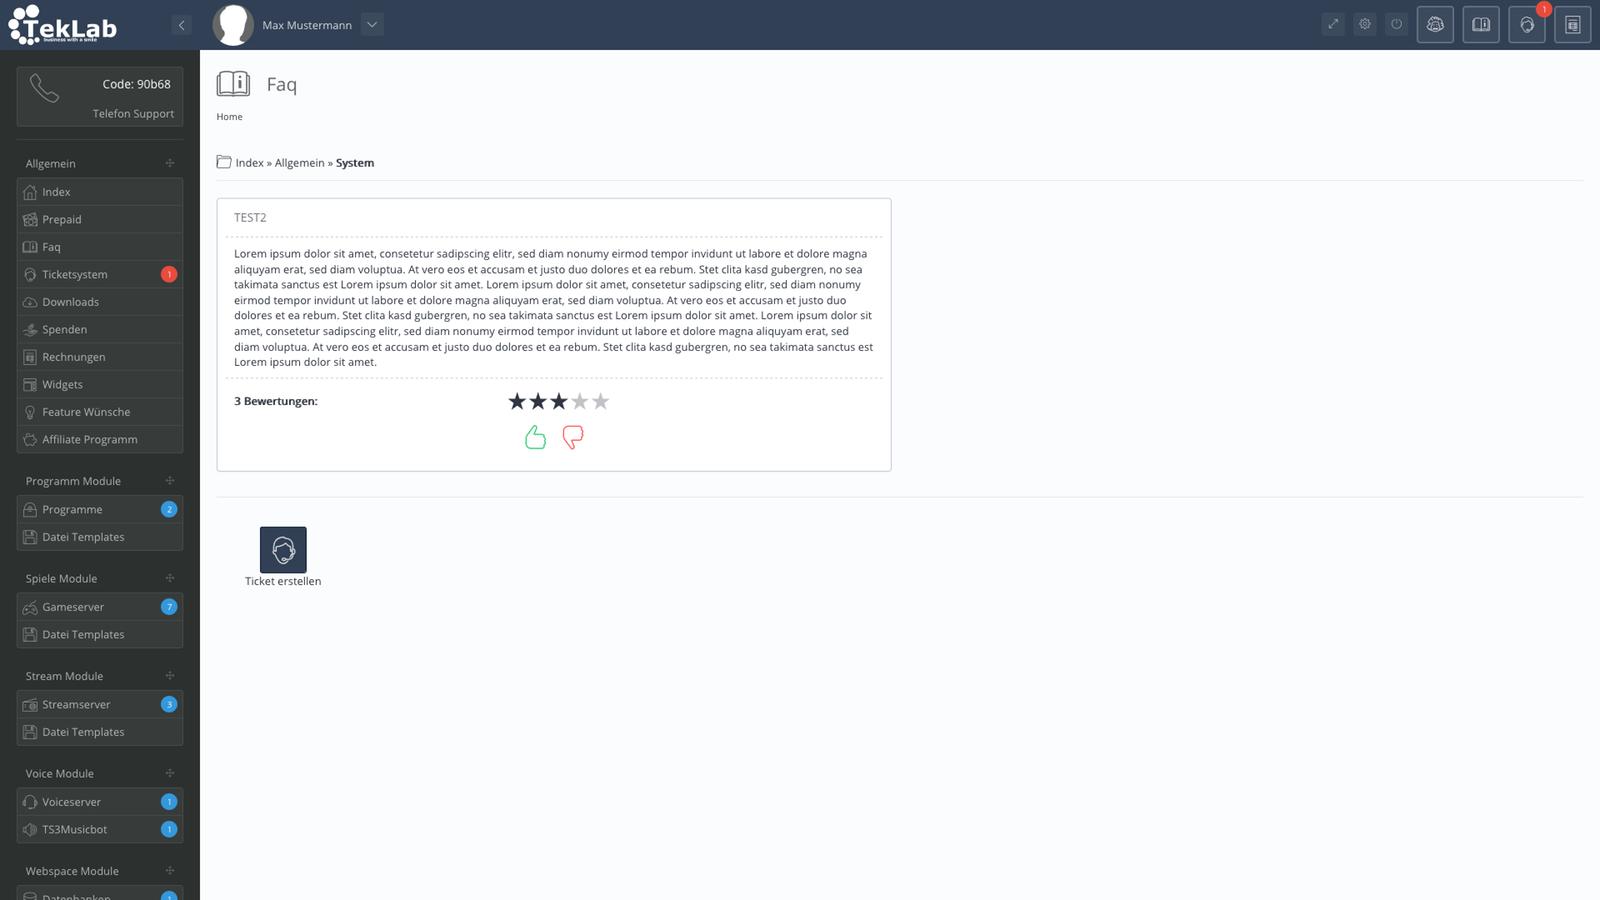 TekBASE Kundenbereich - FAQ